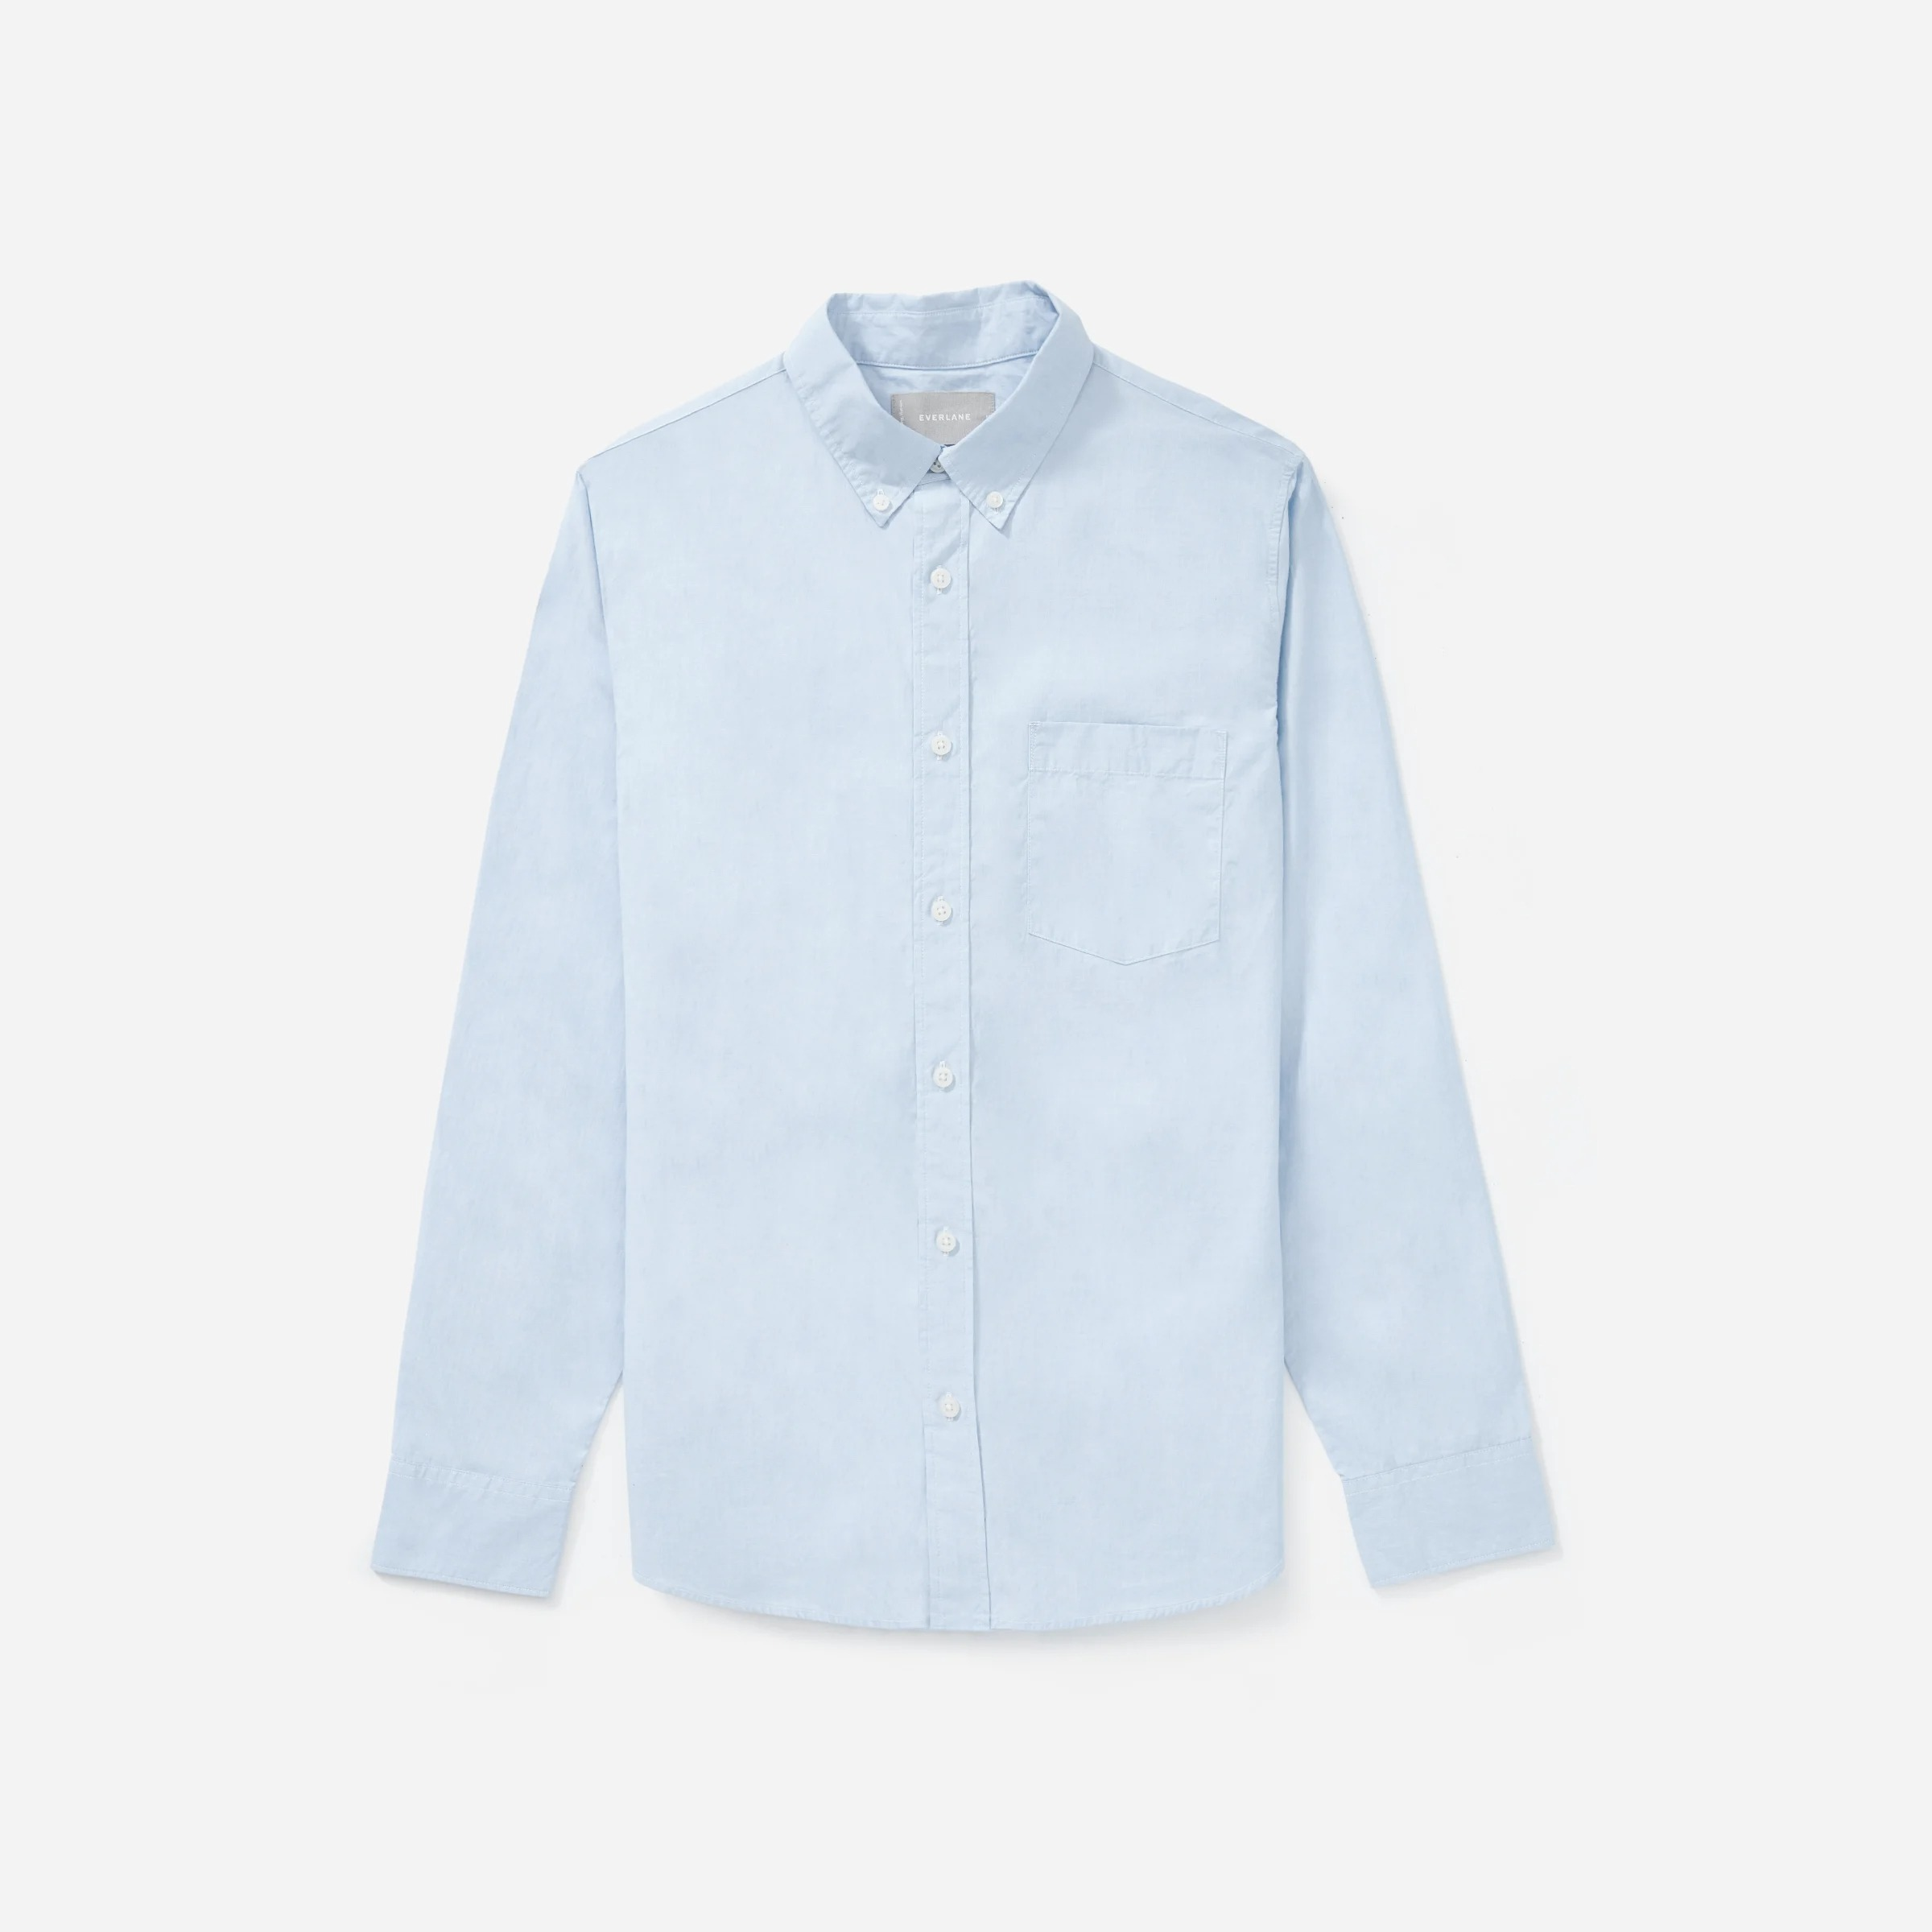 Everlane Oxford Shirts